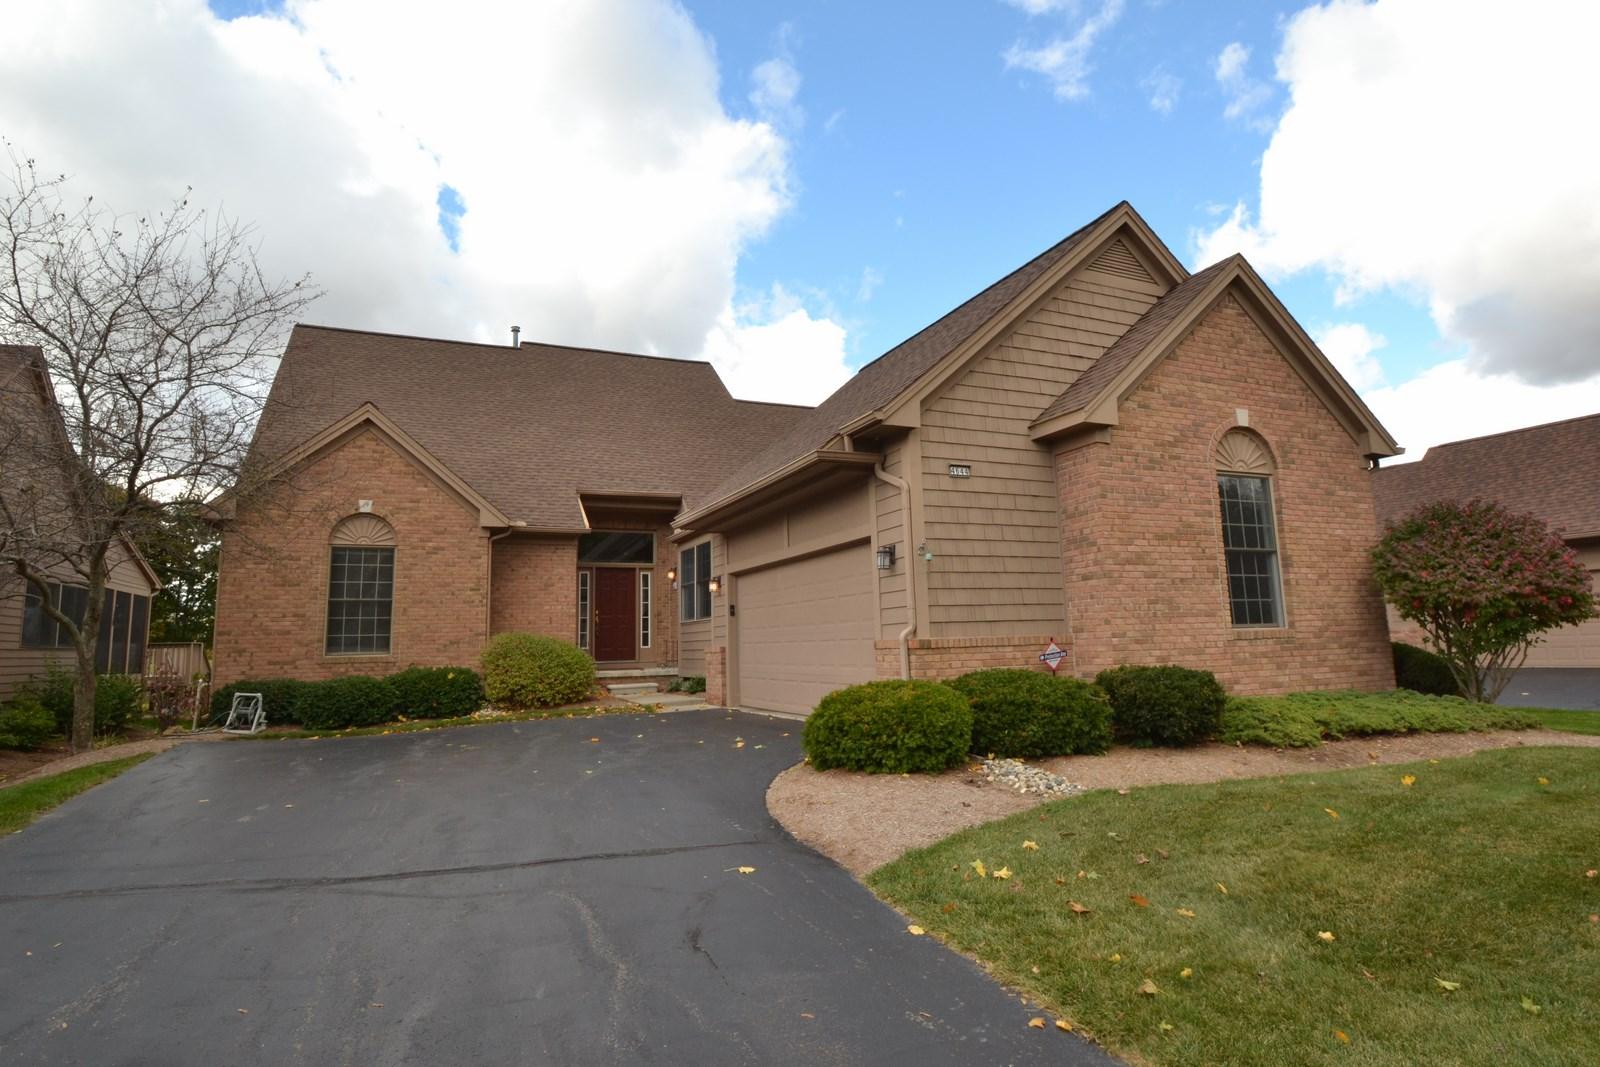 4644 E. Sawgrass Drive, Ann Arbor, MI 48108